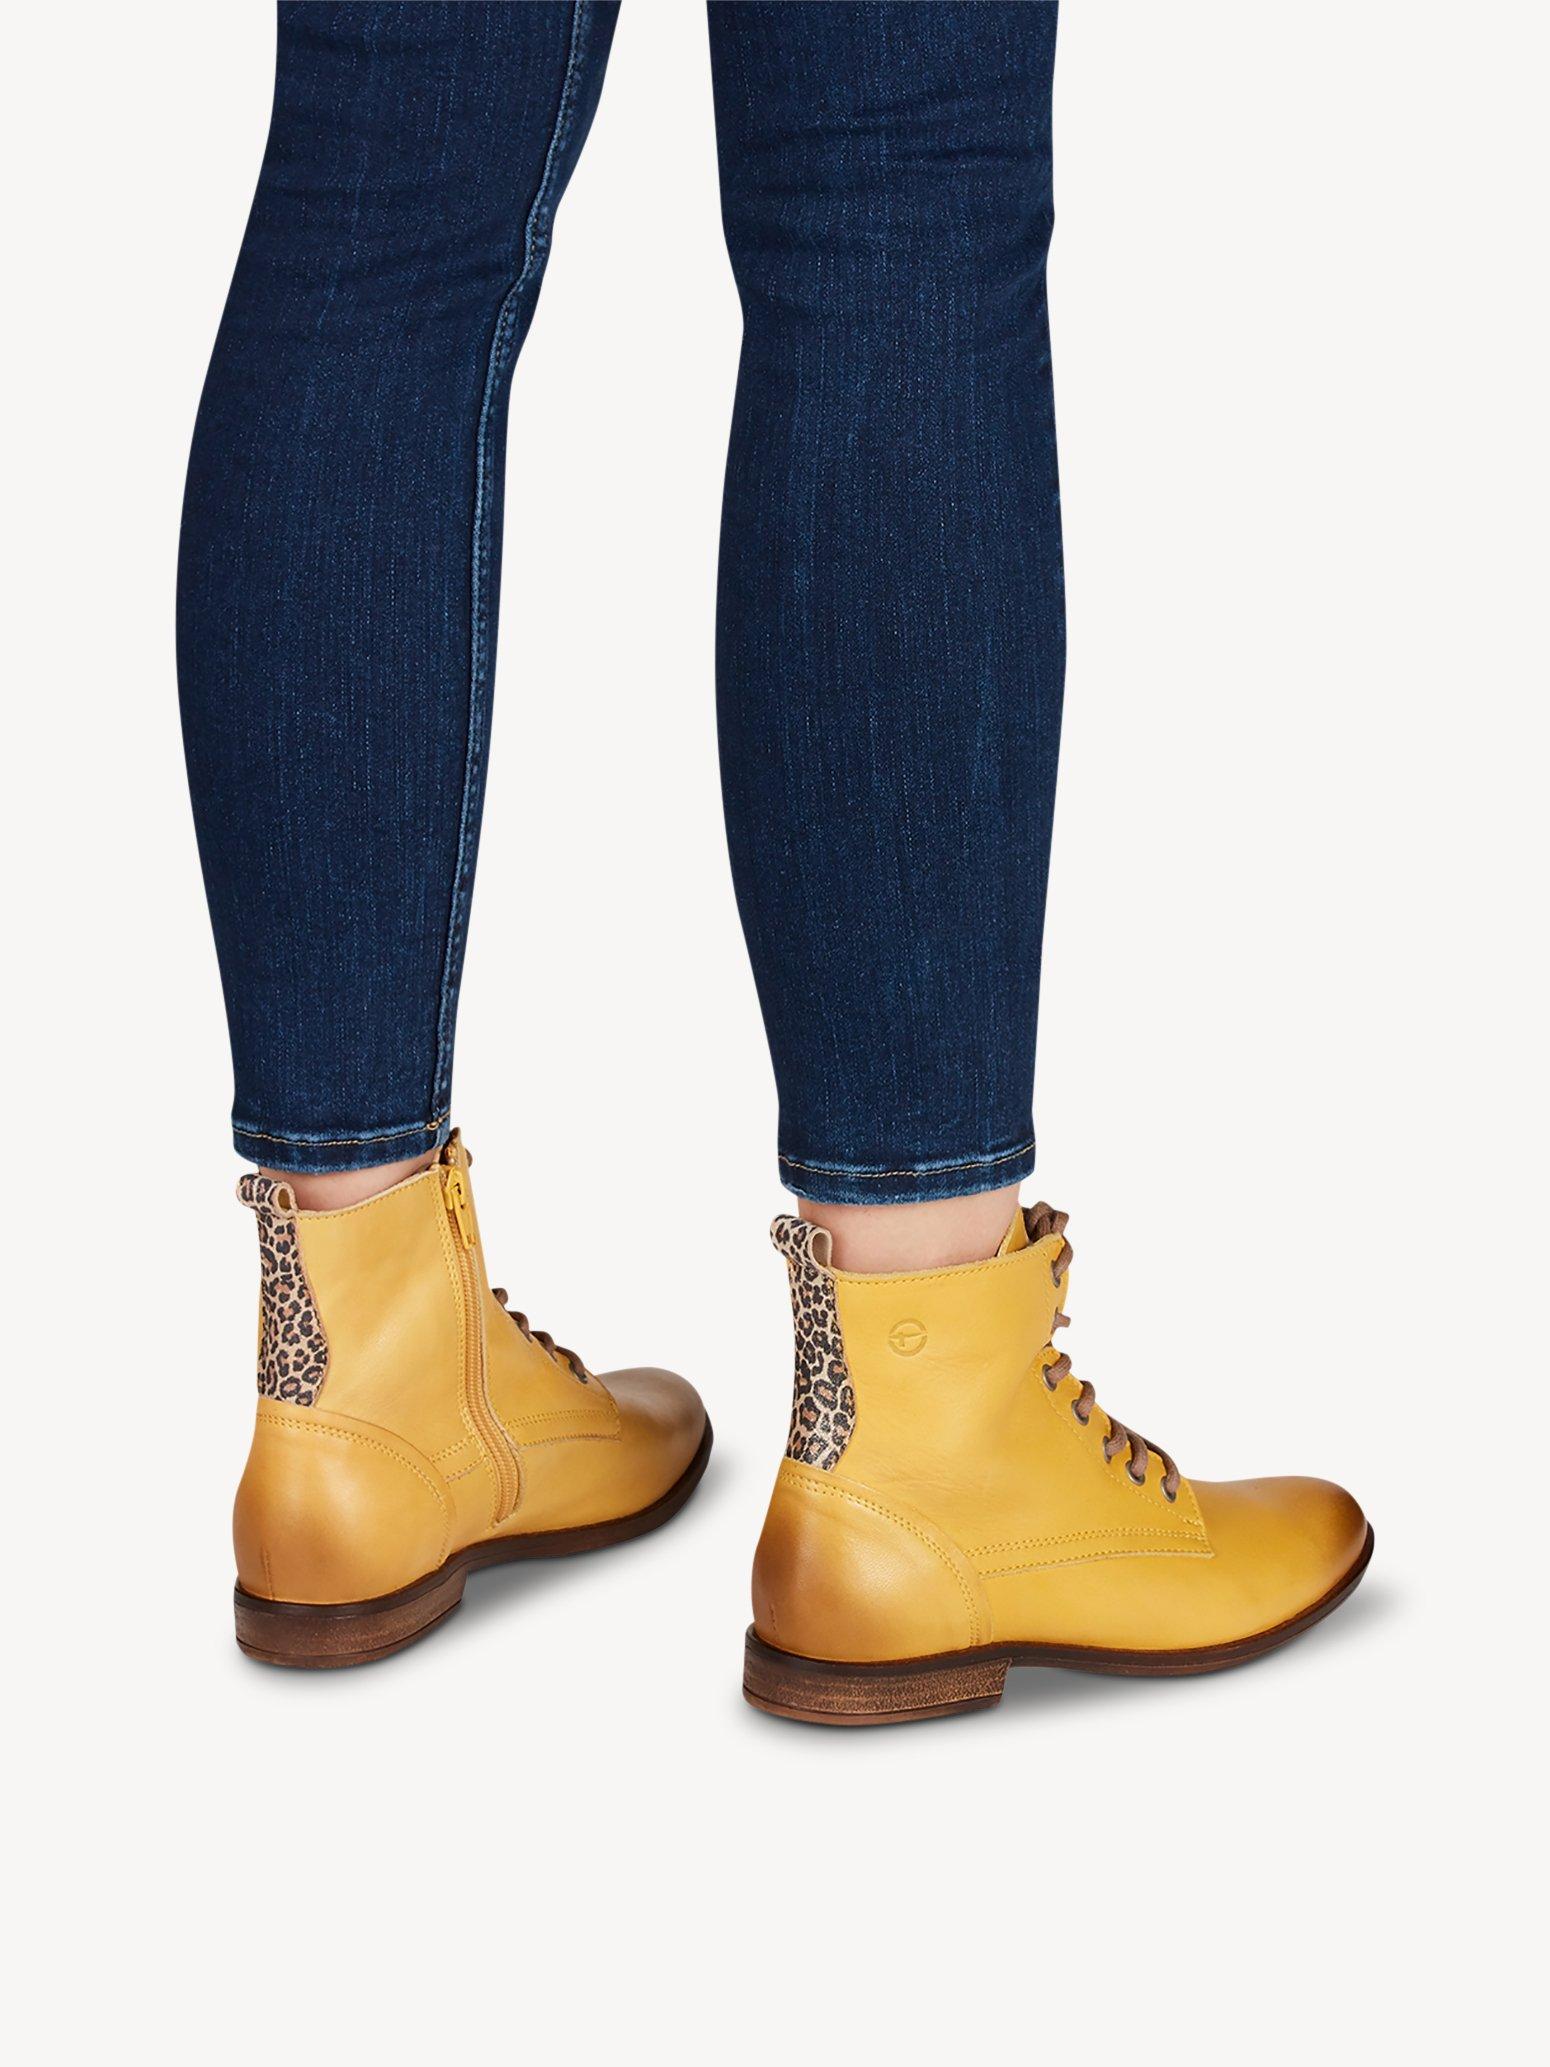 Ботинки Tamaris 1-1-25191-25-602